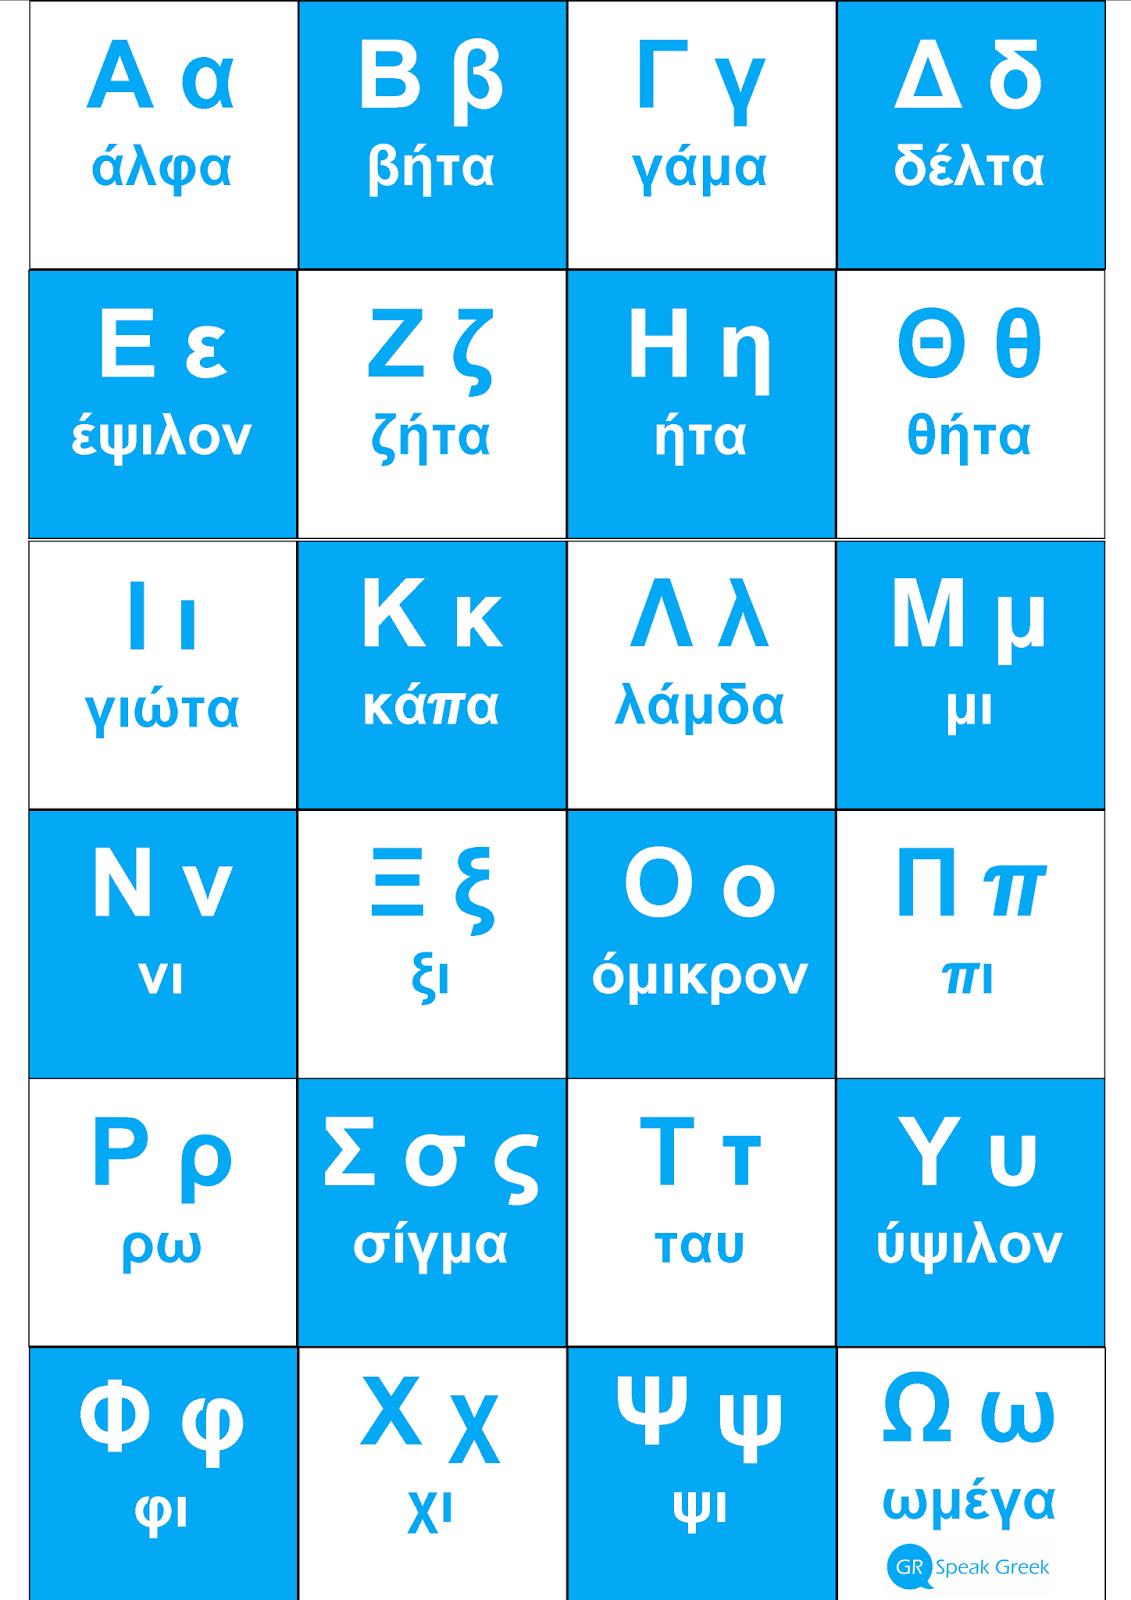 Speak Greek